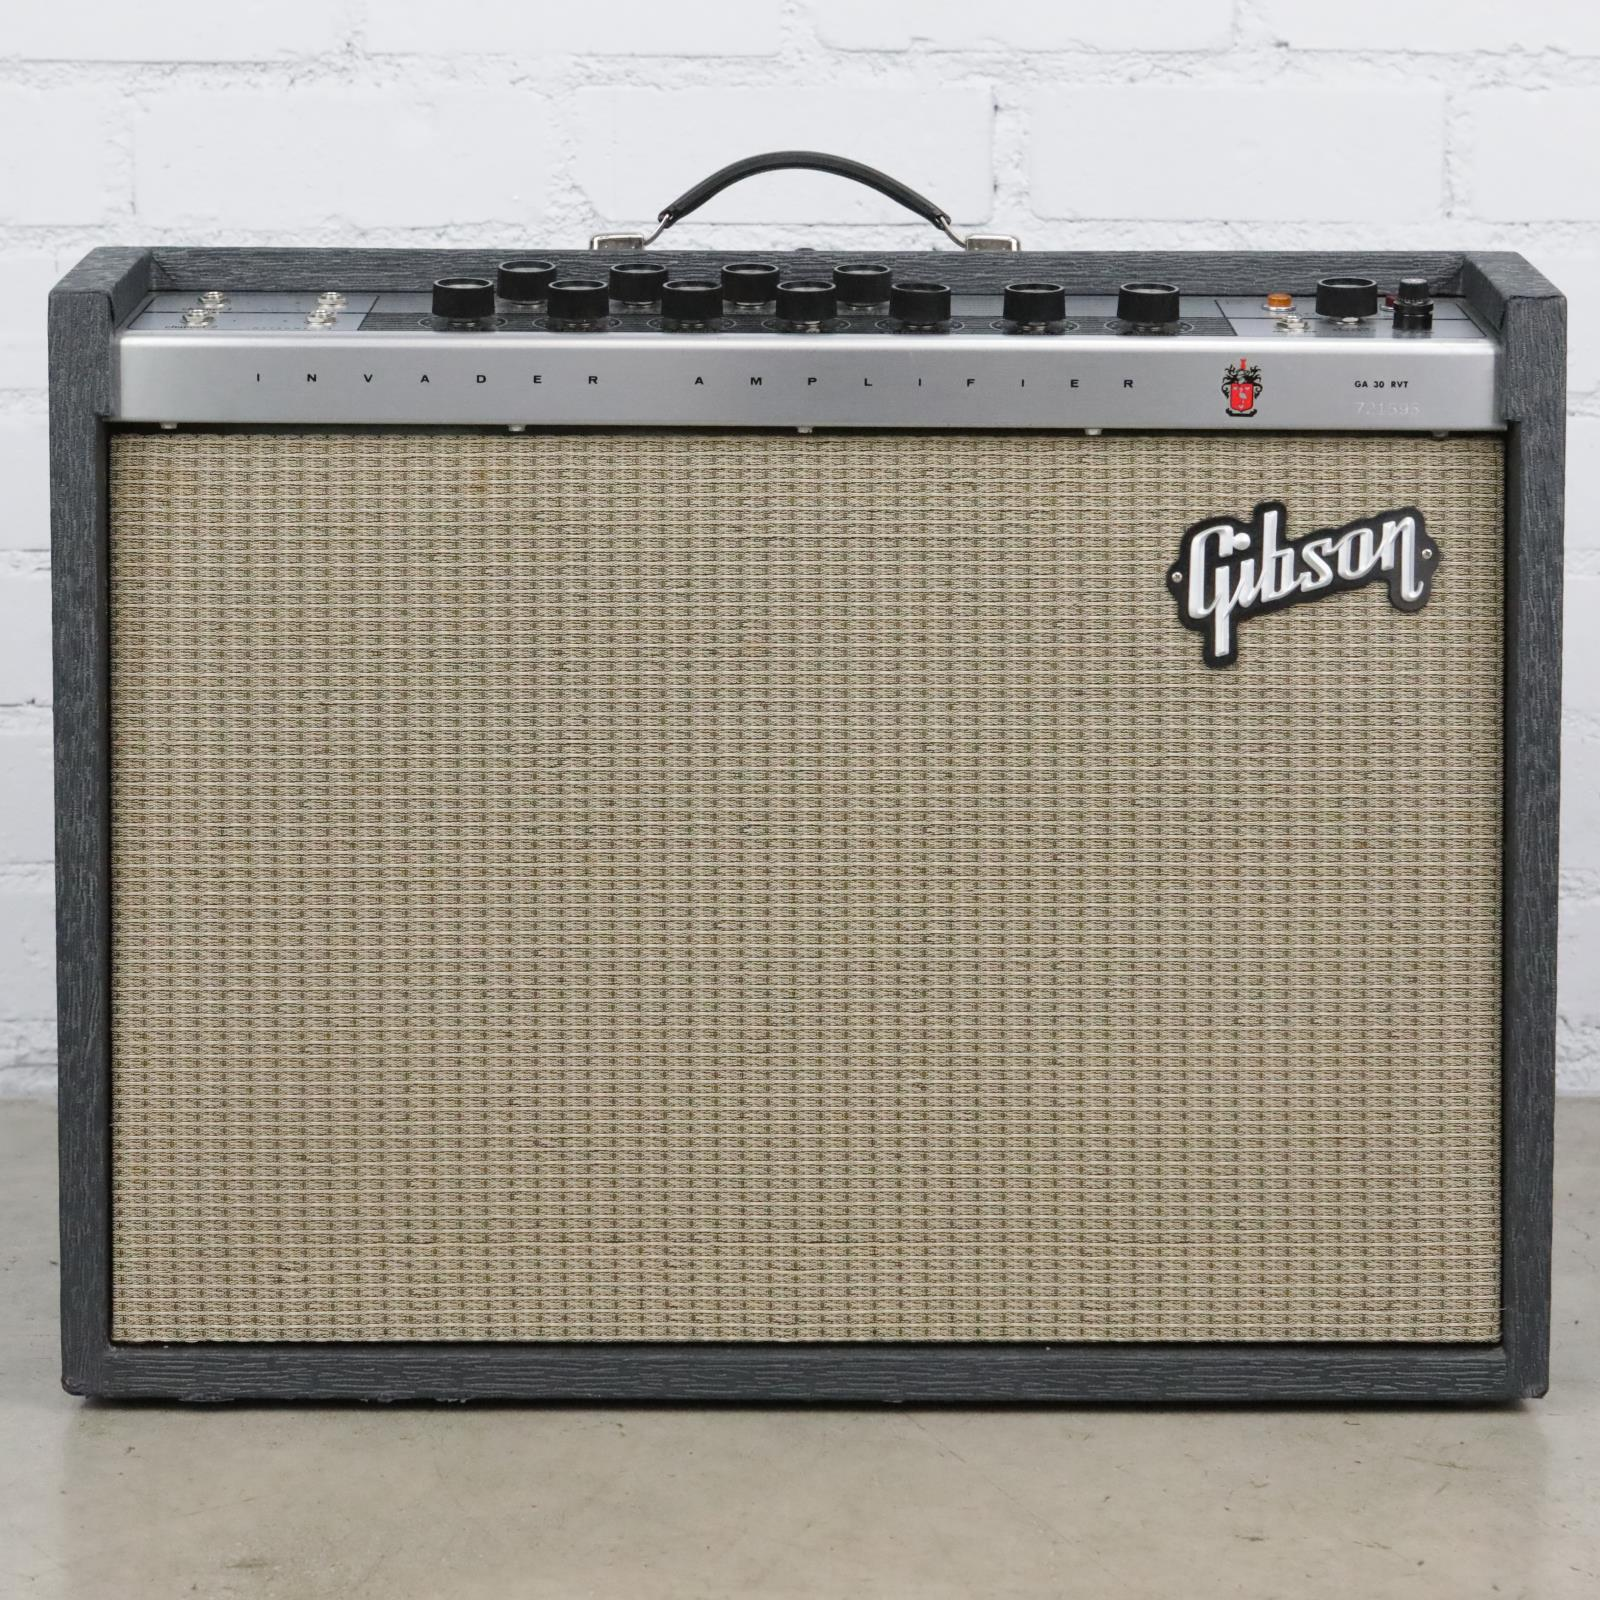 Gibson Invader GA-30 RVT Tube Guitar Combo Amplifier #41588